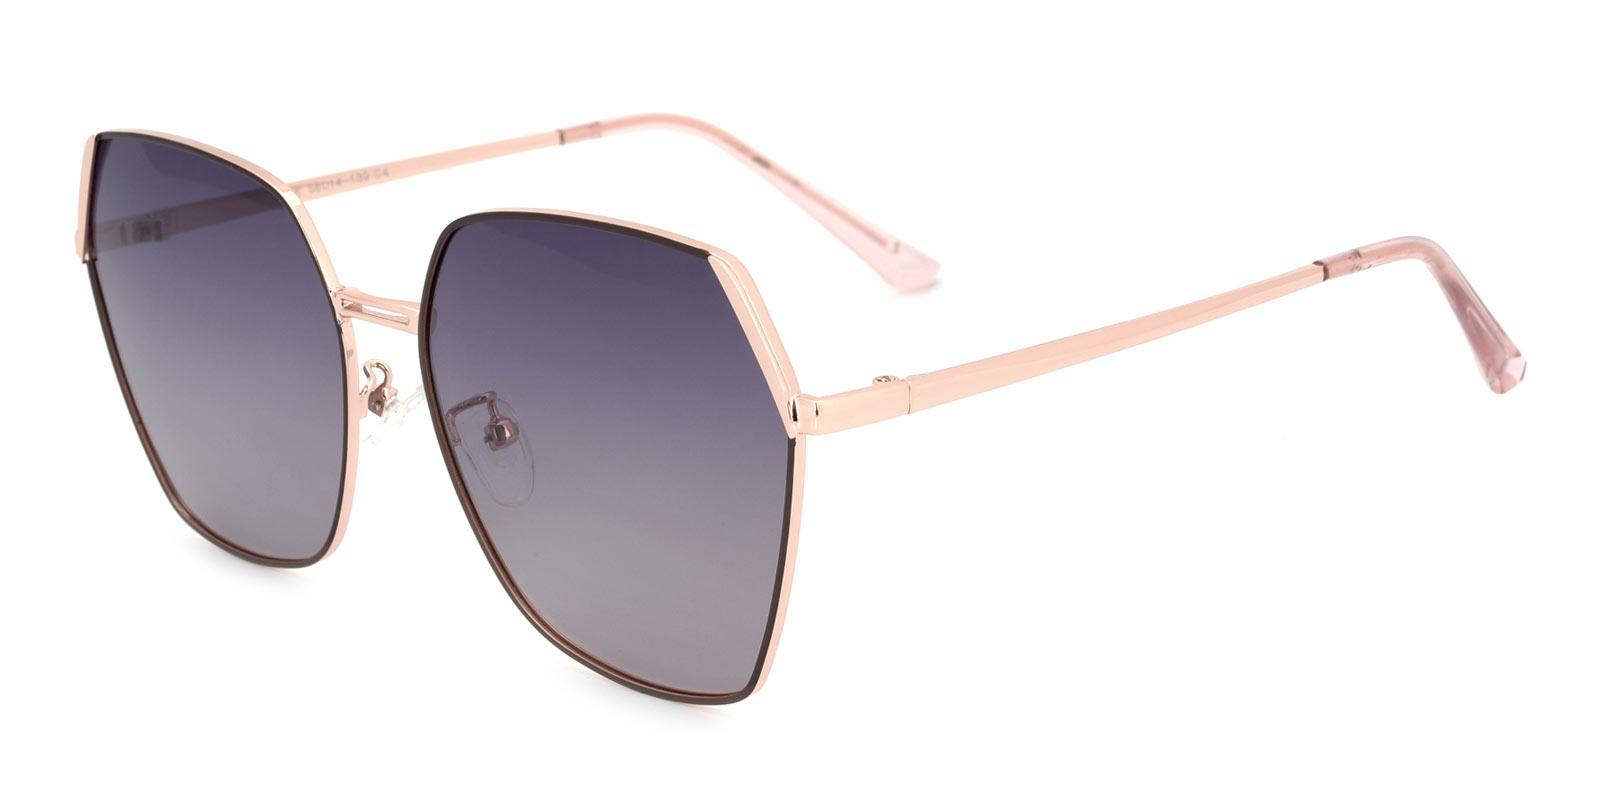 Beam-Gold-Square-Metal-Sunglasses-detail